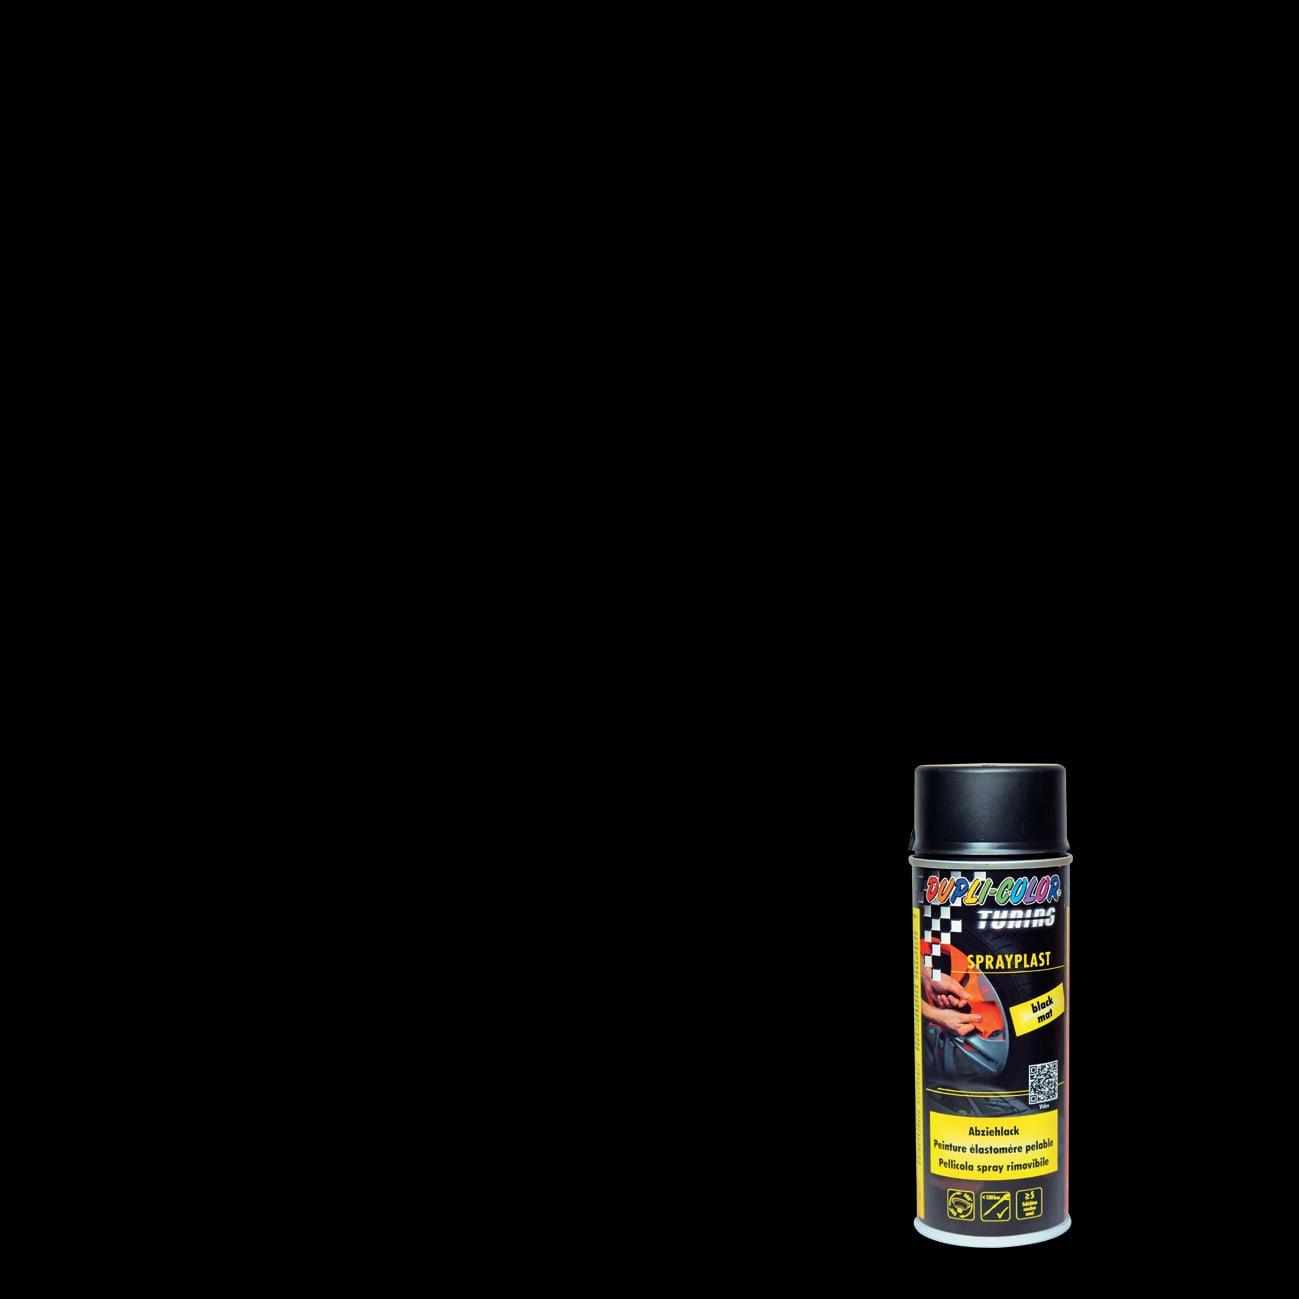 Smalto Spray Base Solvente Dupli Color Sprayplast 0 0075 L Nero Opaco Prezzo Online Leroy Merlin